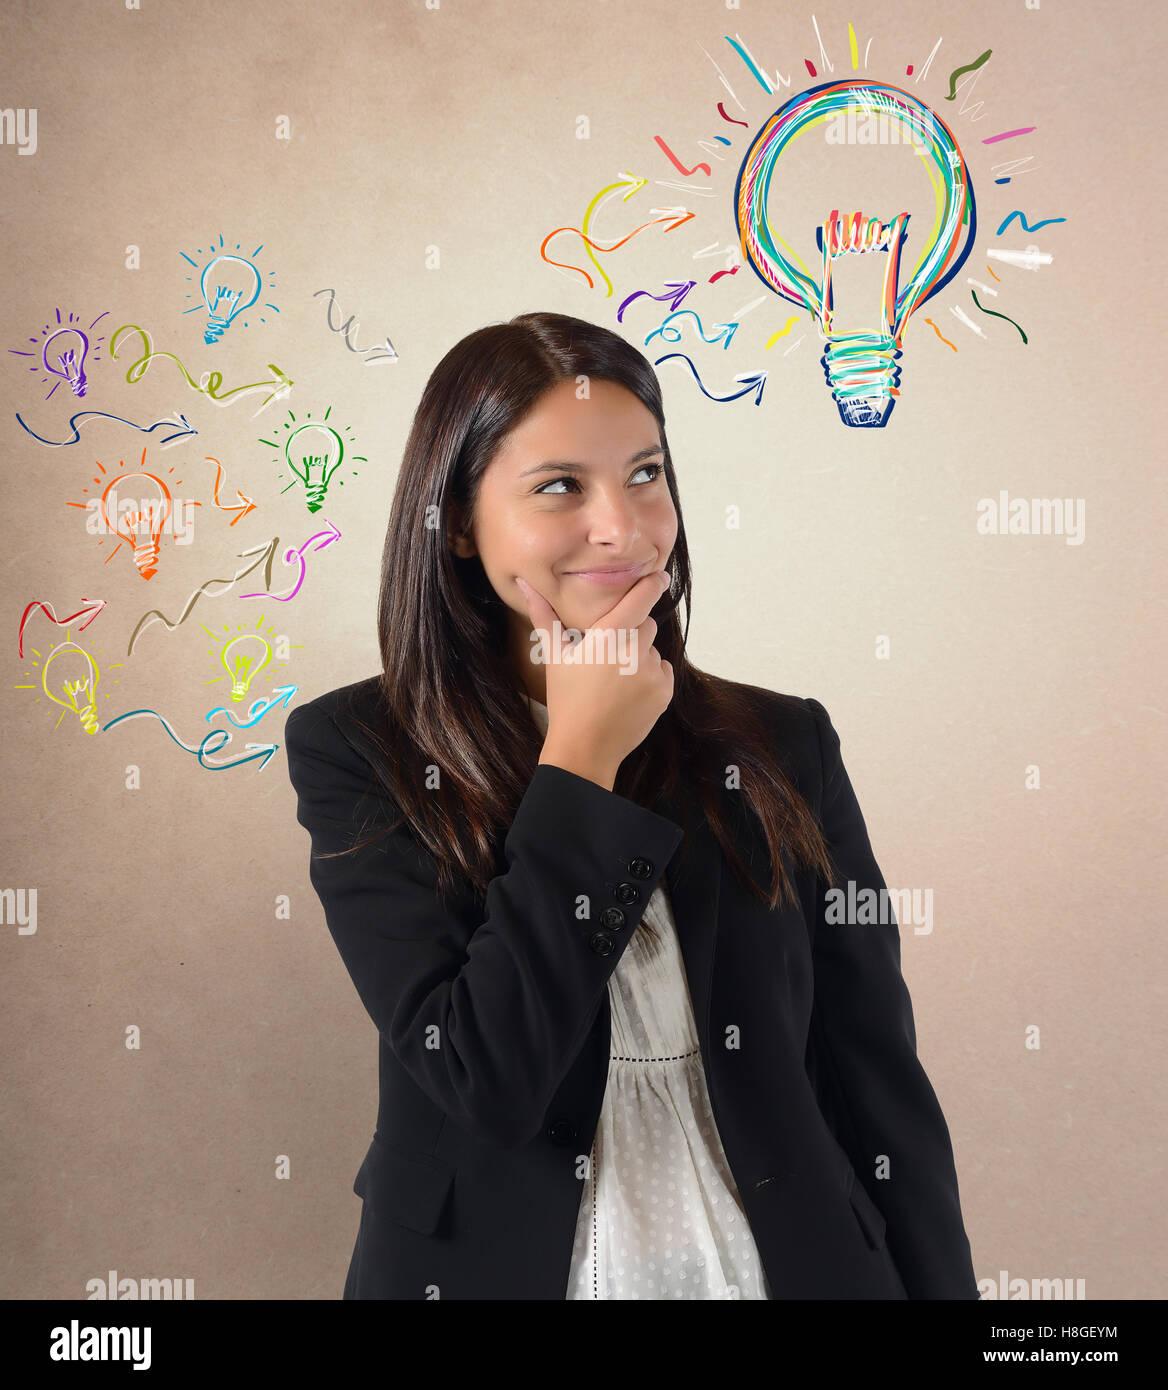 Brilliant idea among many ideas - Stock Image